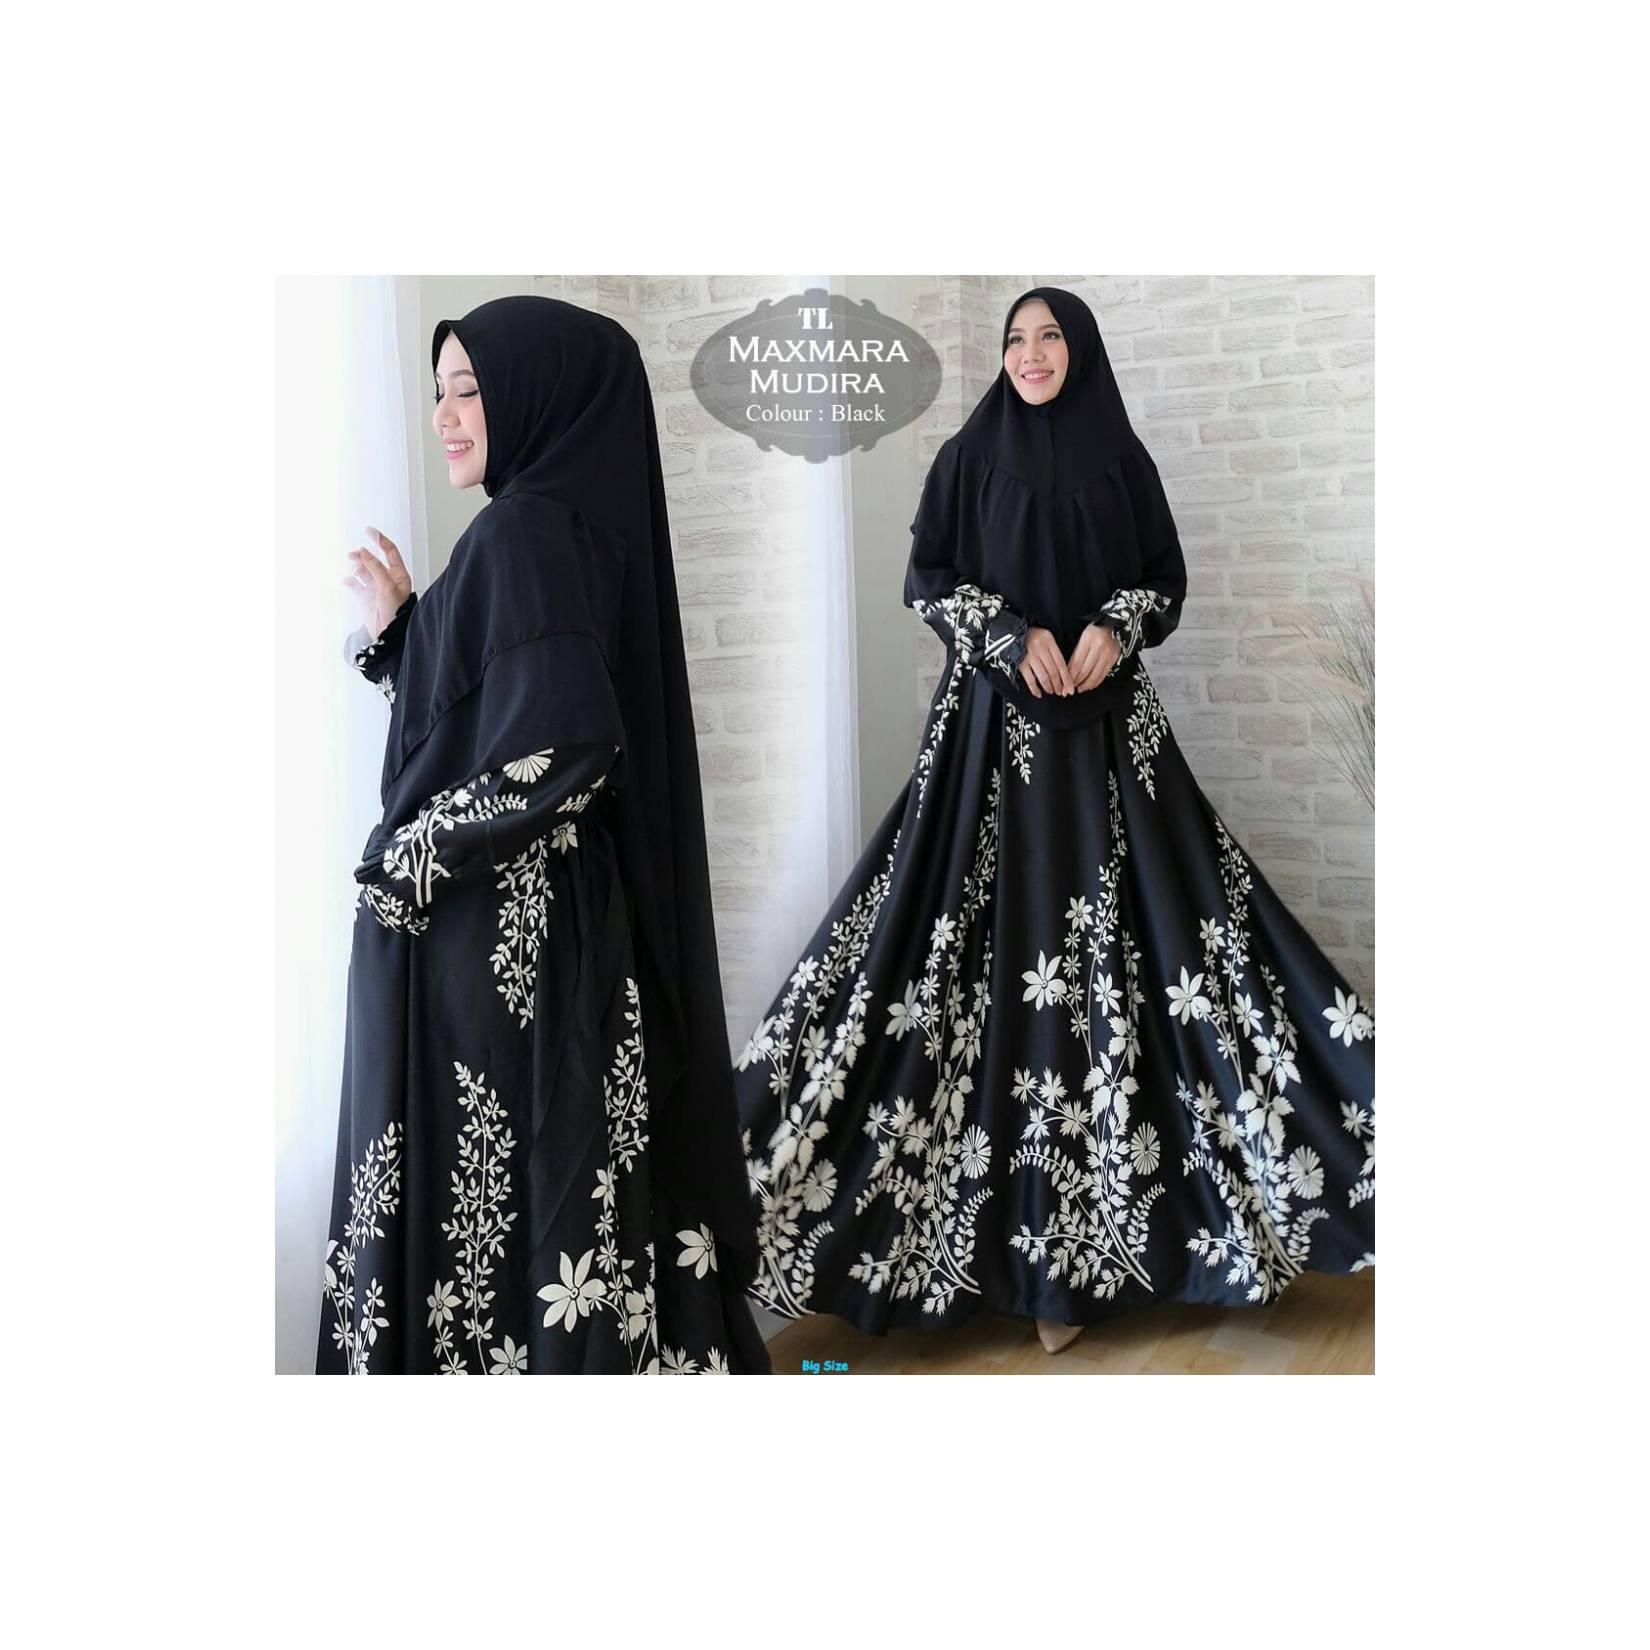 Syar'i Maxmara Mudira-Baju gamis murah-gamis wanita gemuk-Fashion-TL